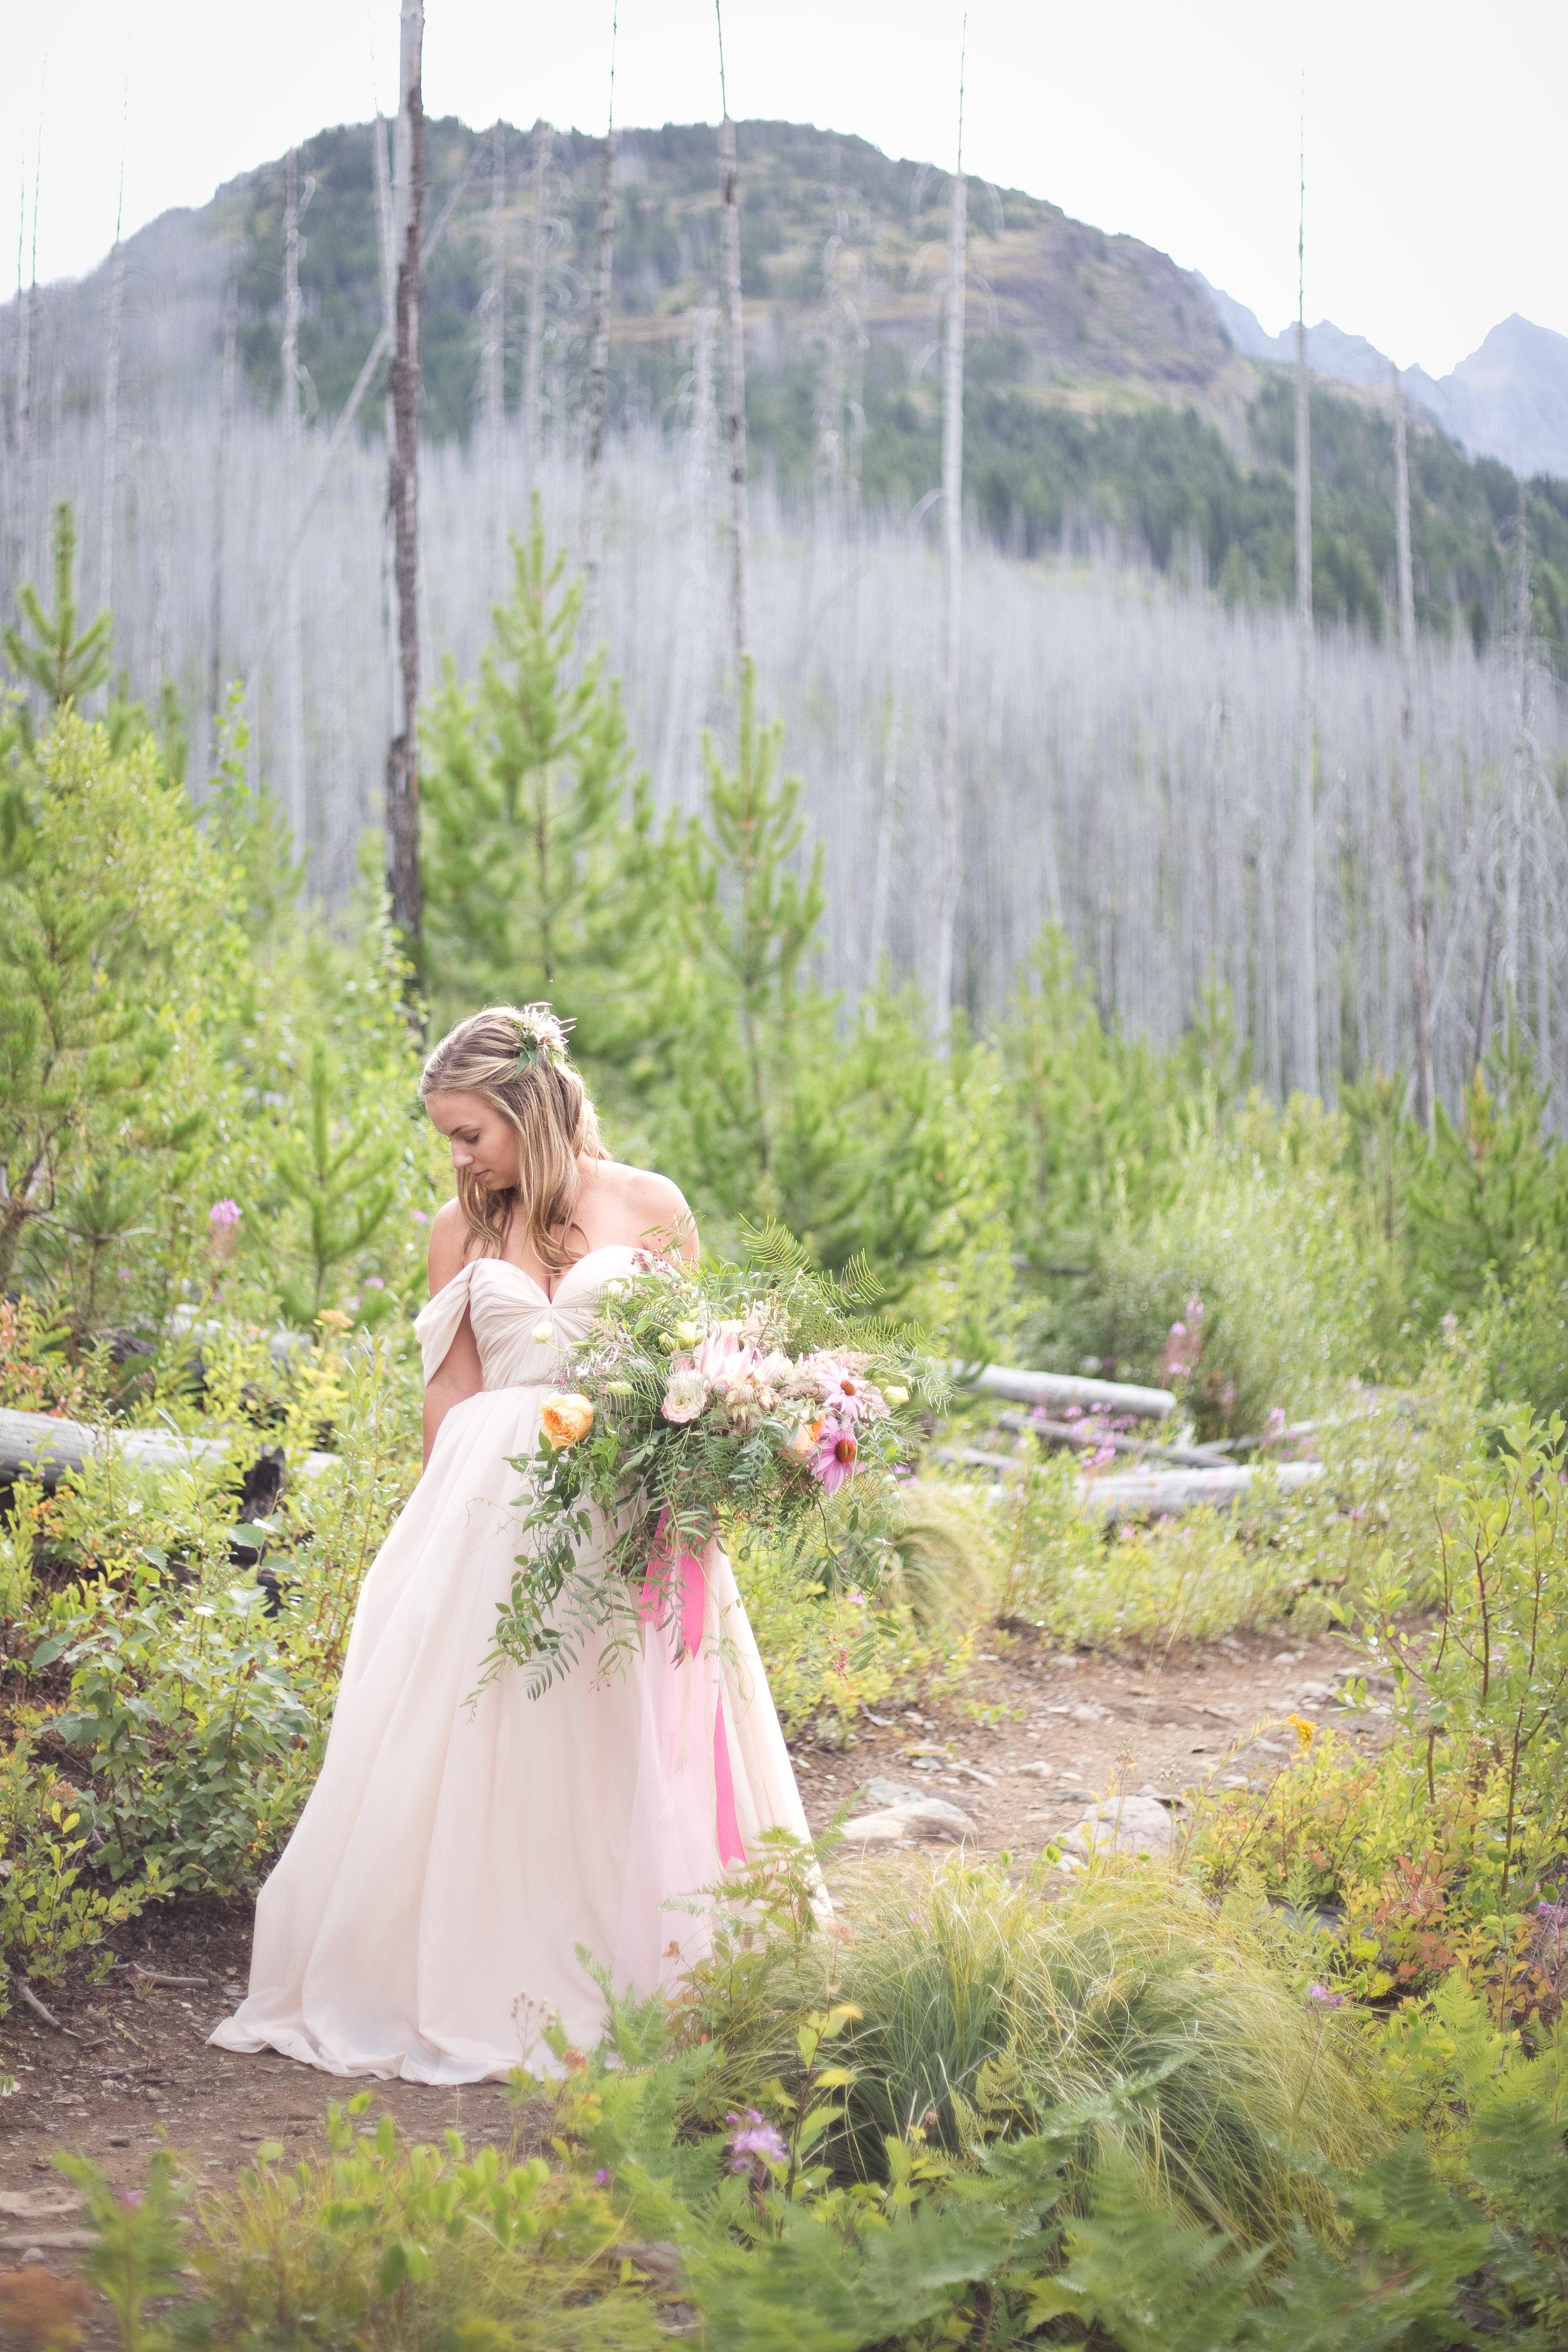 AshleyTintingerPhotography-Missoula-Bitterroot-Destination-WeddingPhotographer-GlacierStyledShoot2015-15.jpg